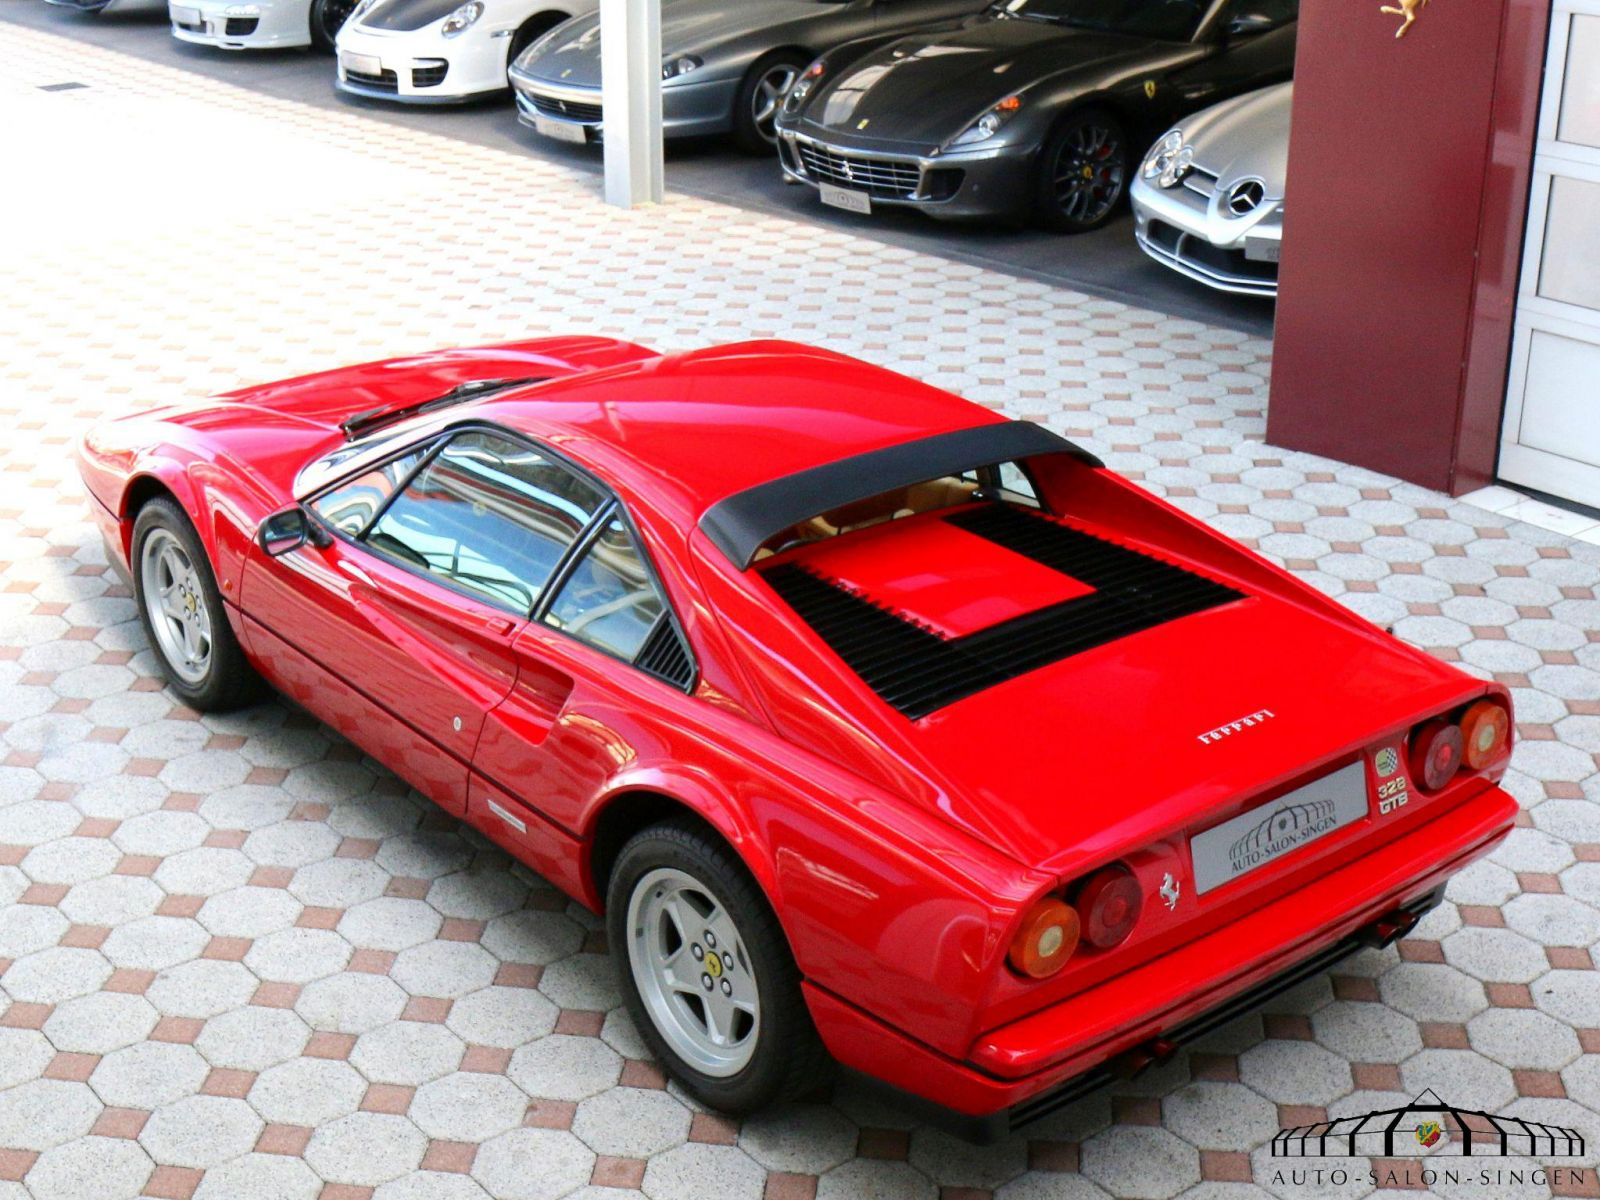 Ferrari 328 Gtb Coupé Auto Salon Singen